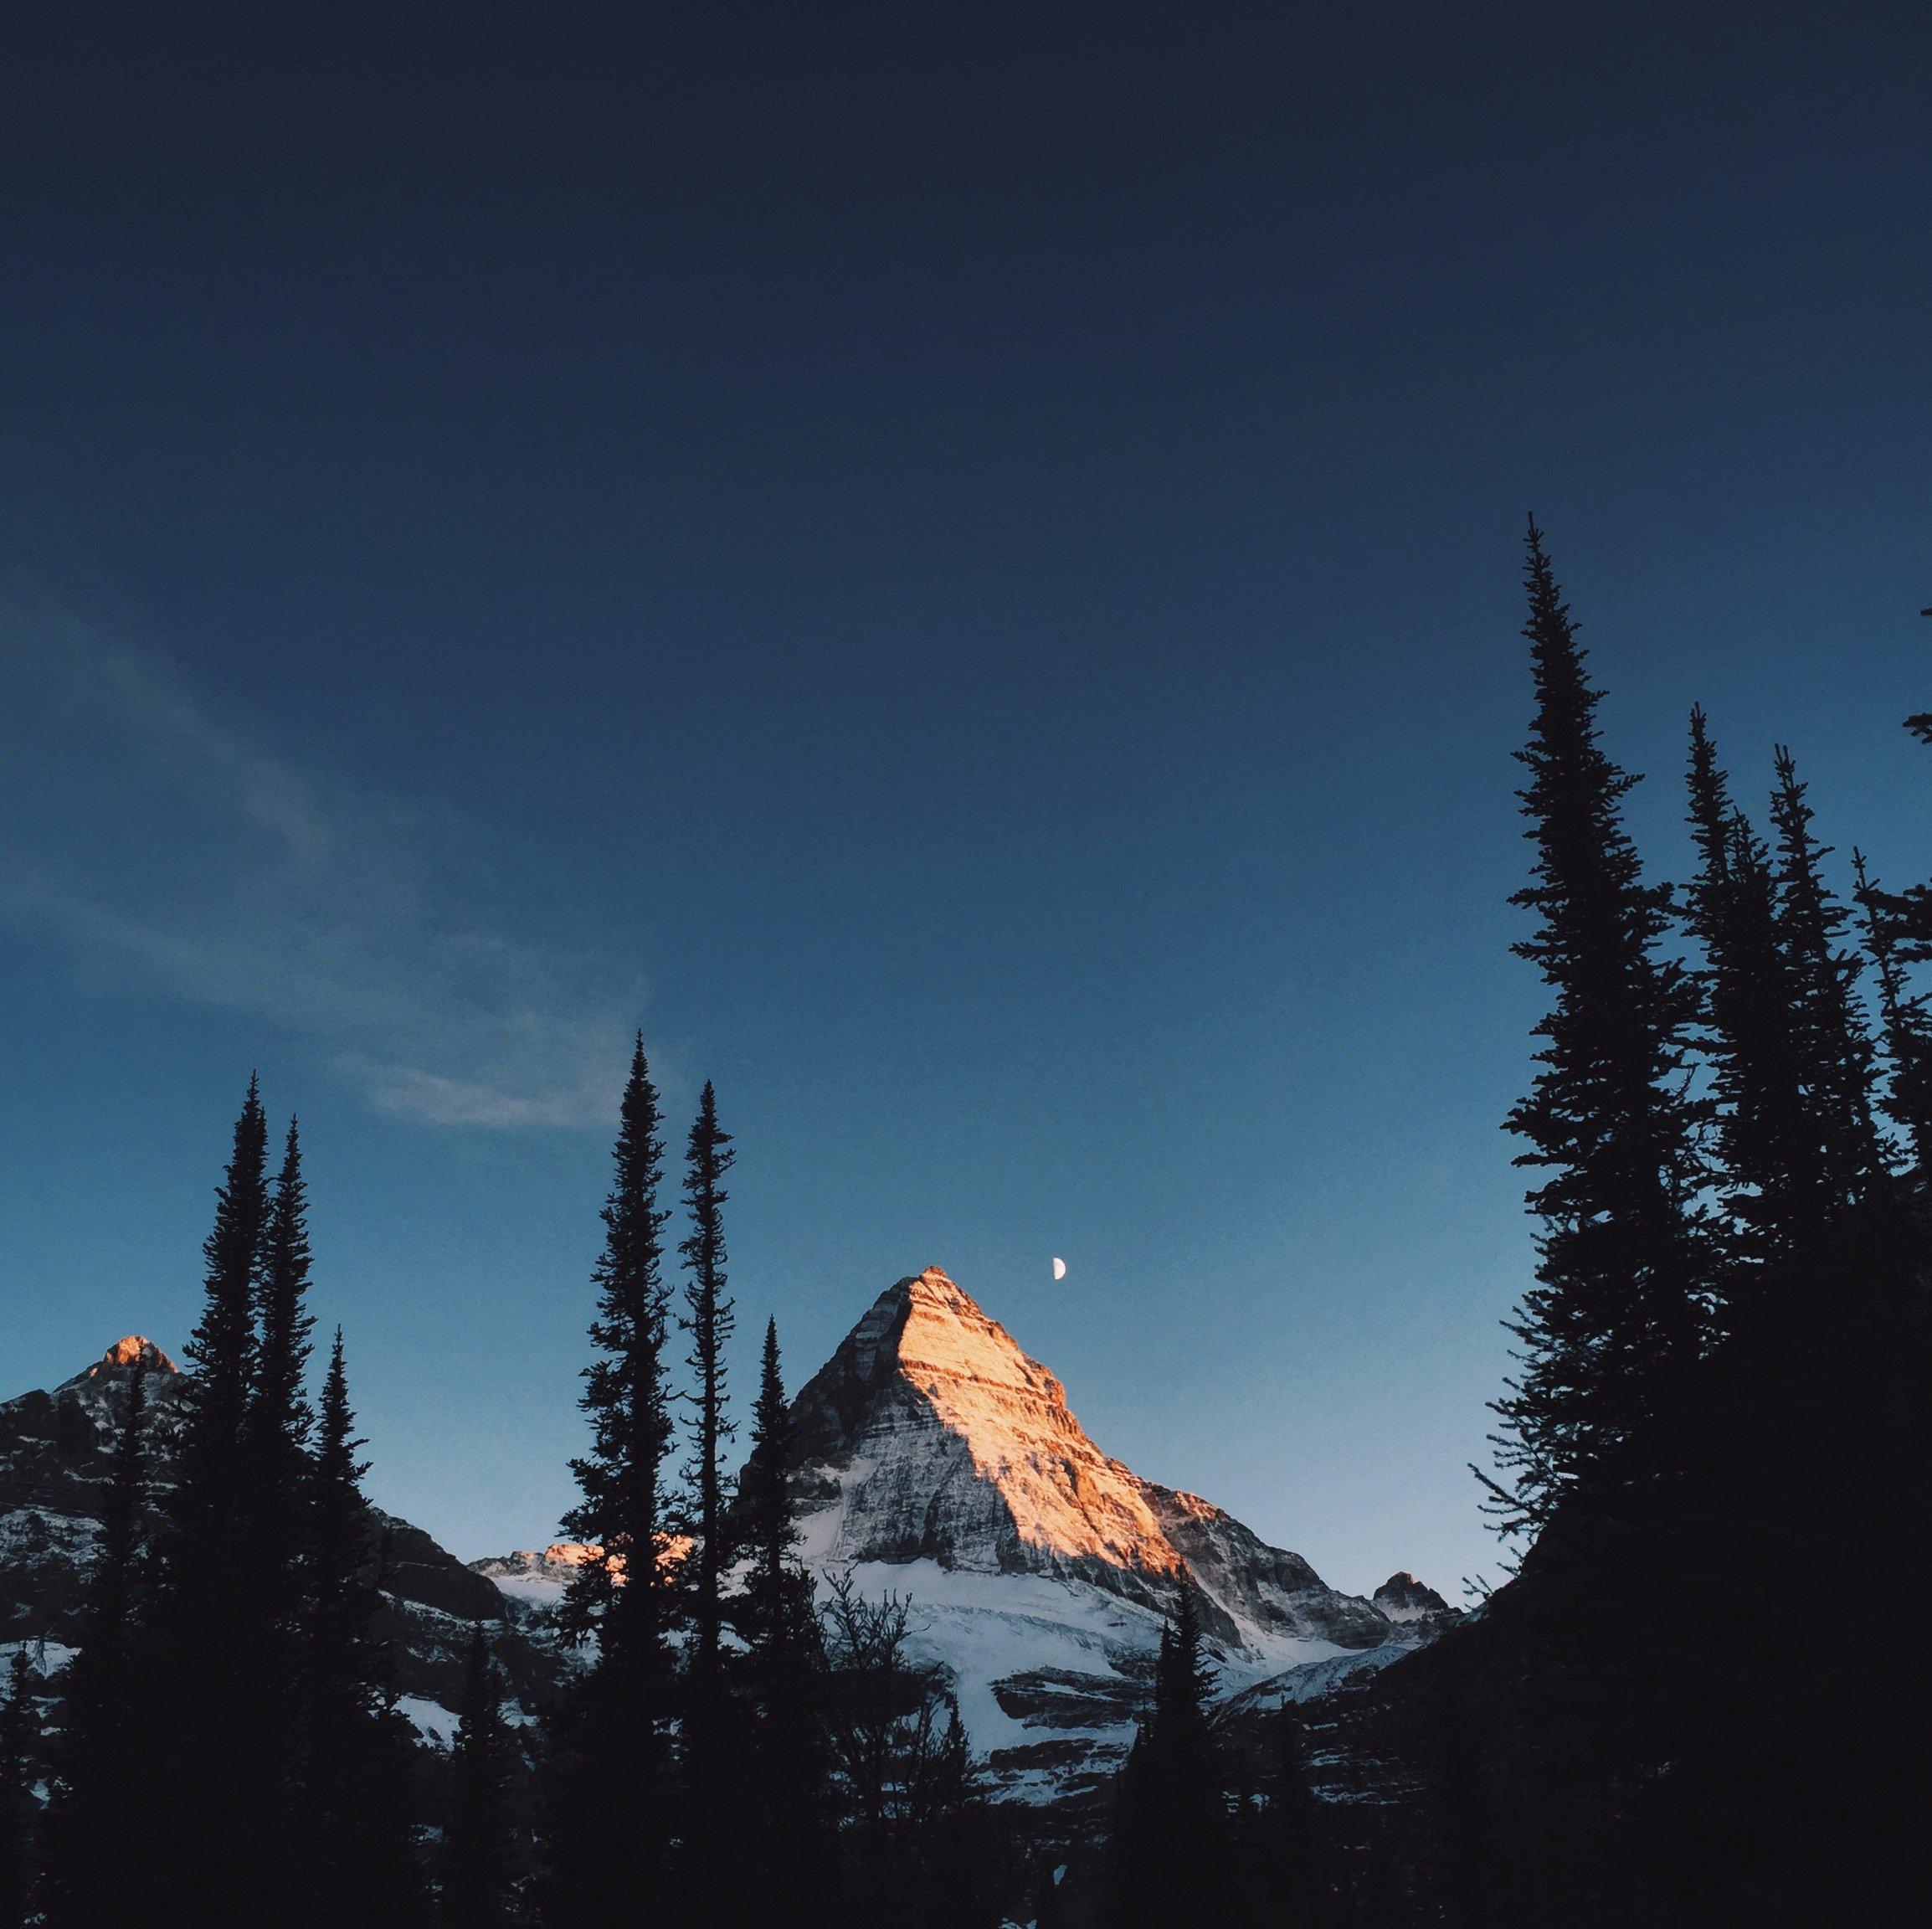 Alpenglow on Mount Assiniboine BC HD wallpaper 2308x2304